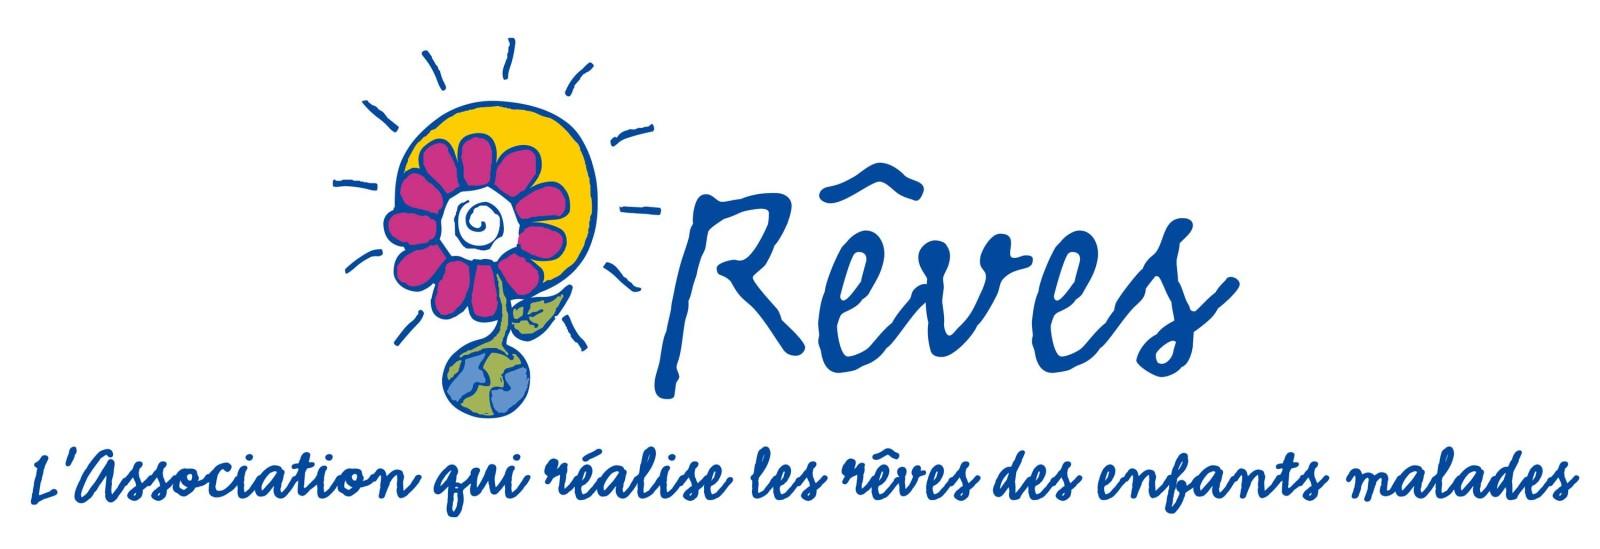 http://quichottine.fr/wp-content/uploads/2011/11/Logo-slogan-coul.jpg